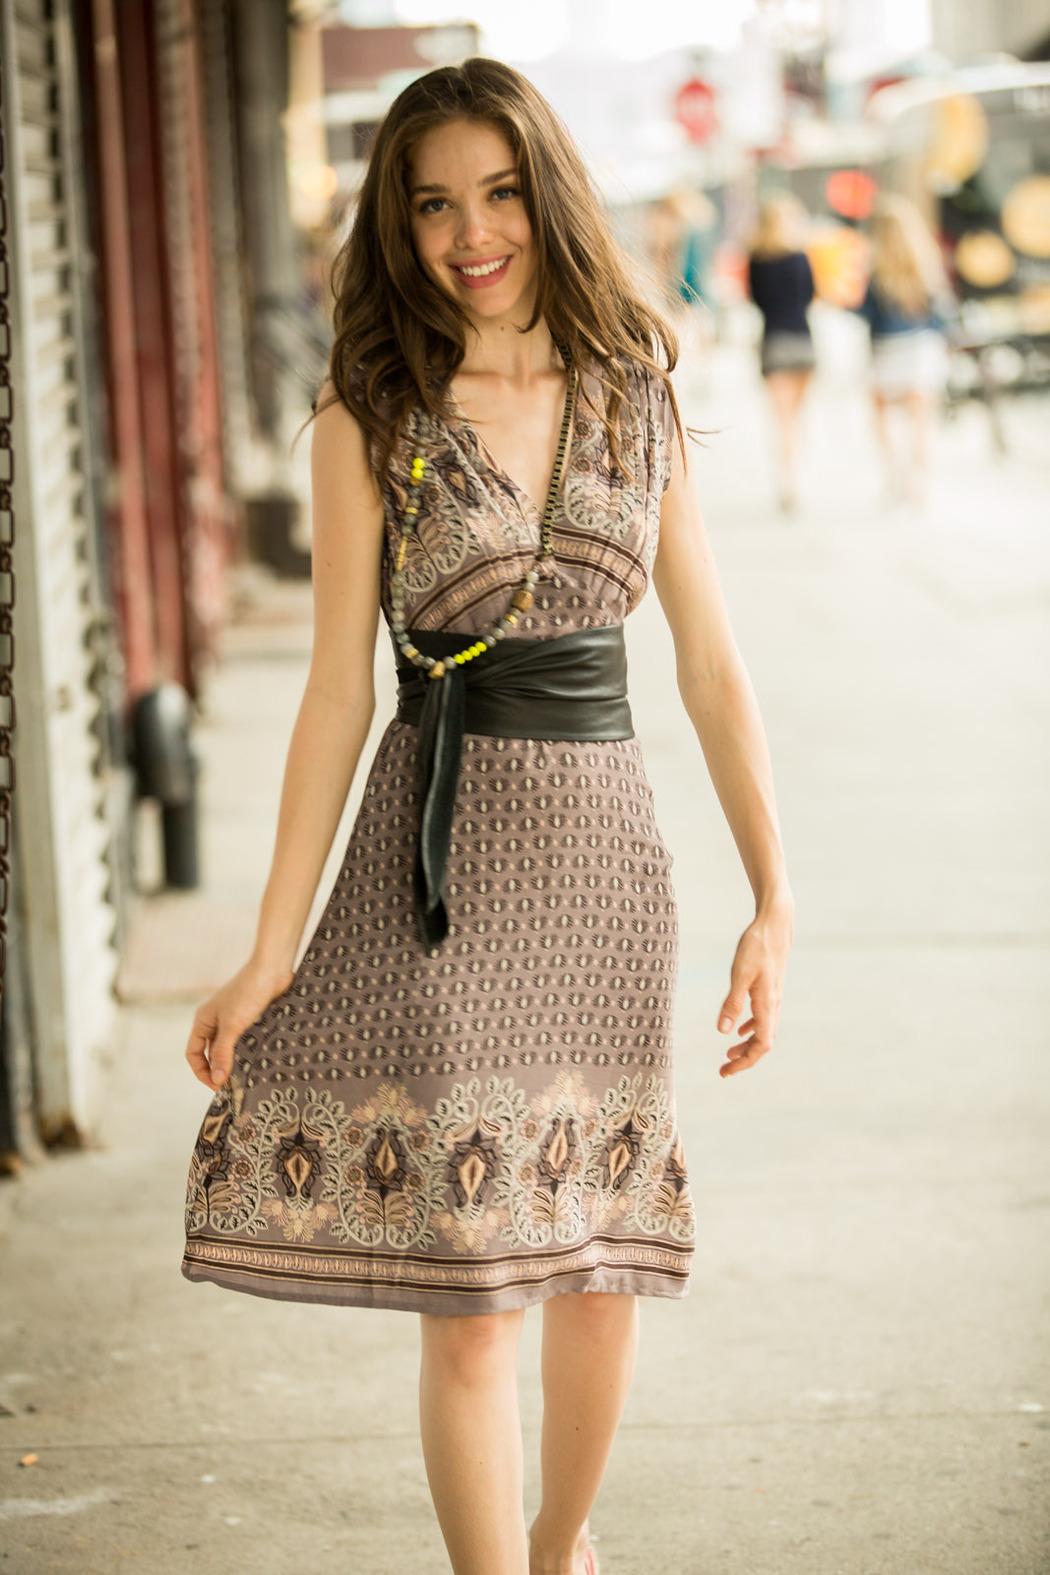 wrap-belt2 5 Hottest Spring & Summer Accessories Fashion Trends in 2020